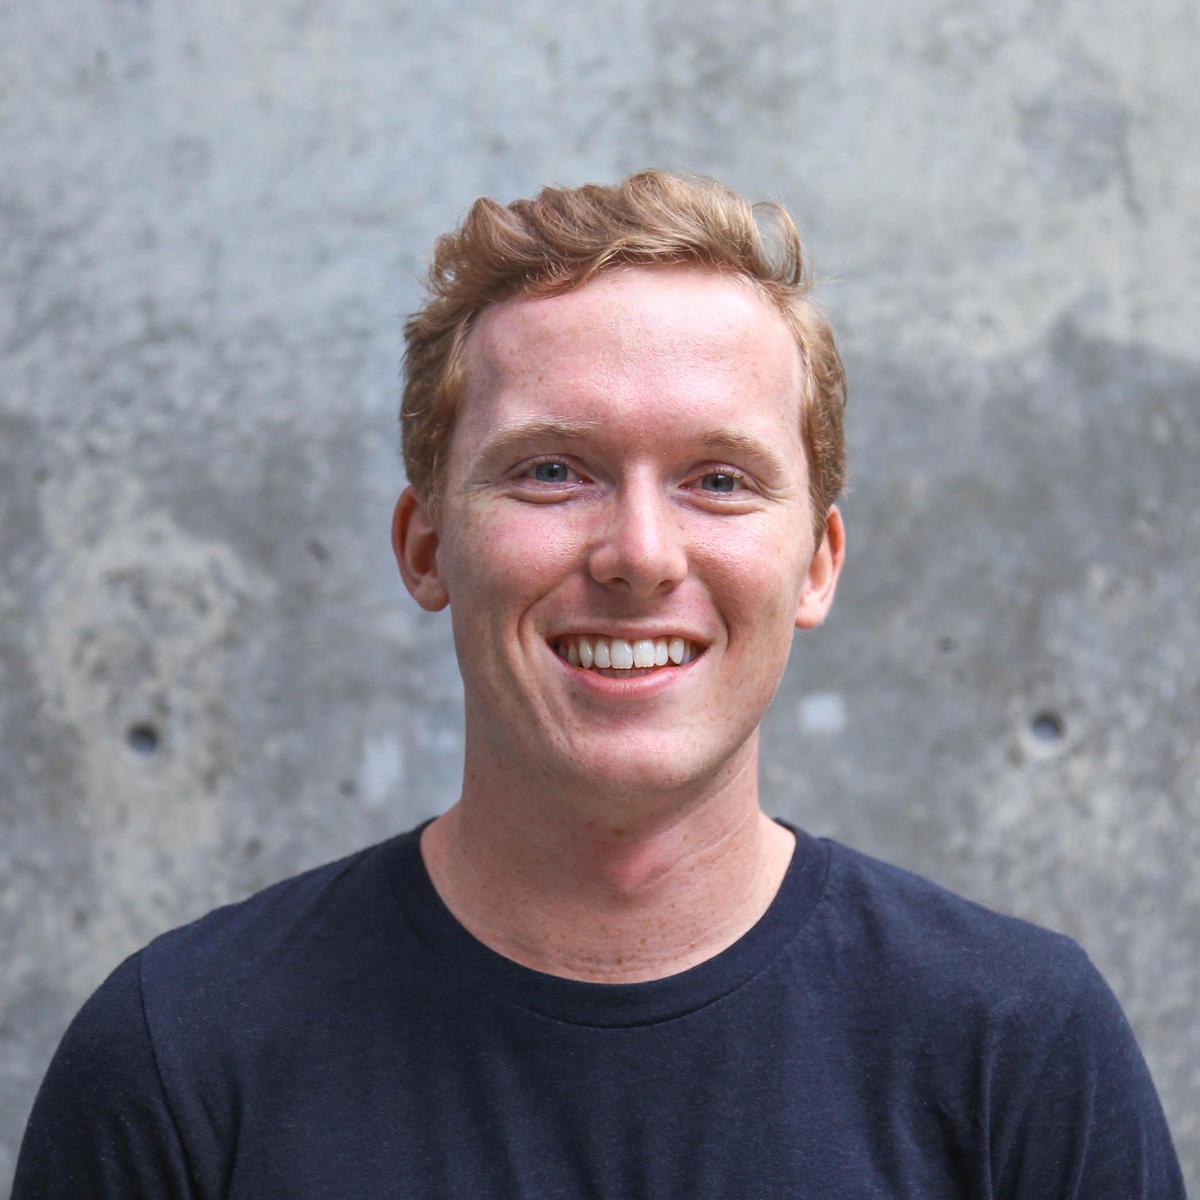 Sam Euerle, Student Technology Consultant